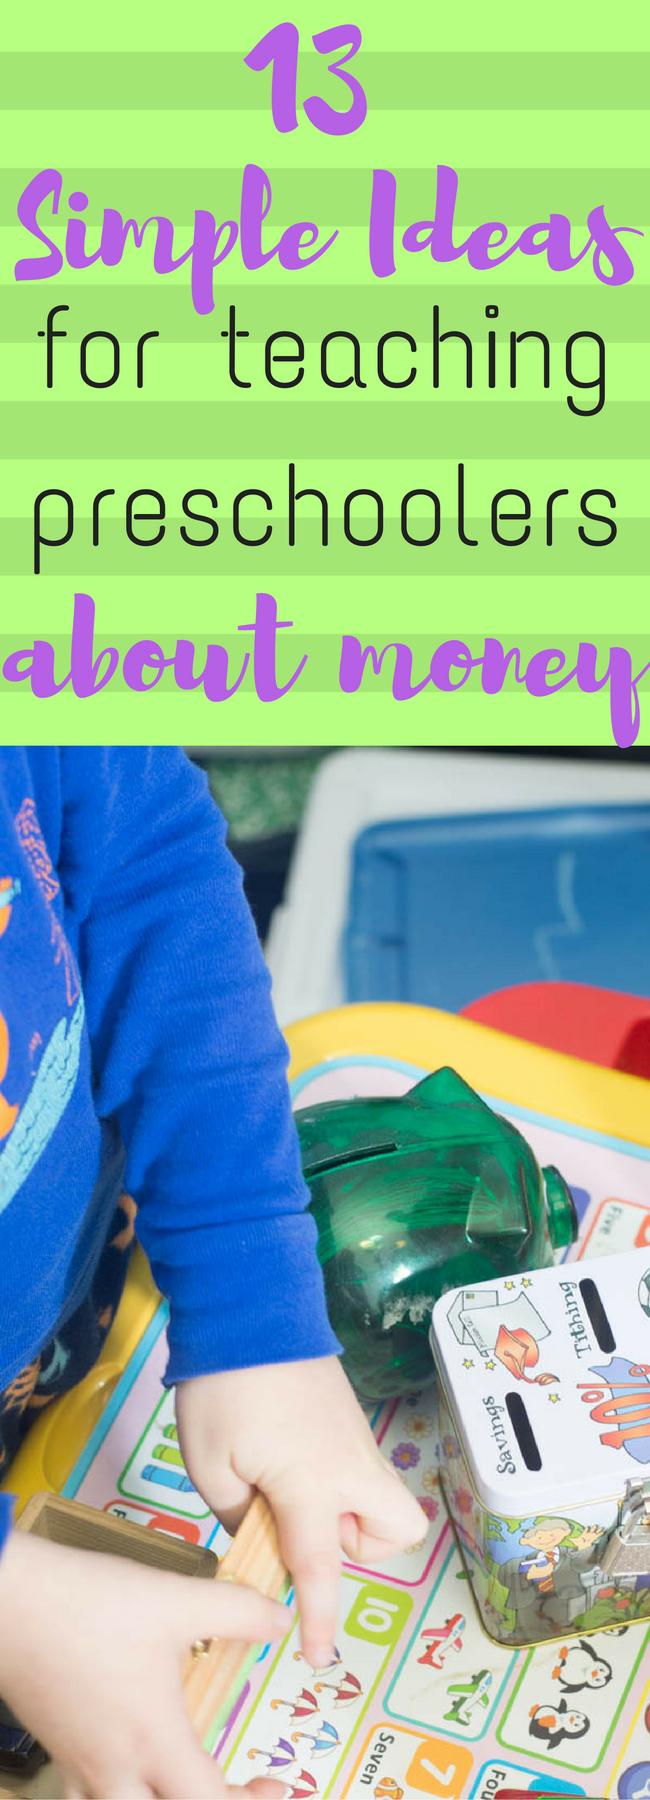 Preschool learning / preschool math / teach preschooler about money / money management /money tips / frugal living / life lessons / preschool via @clarkscondensed